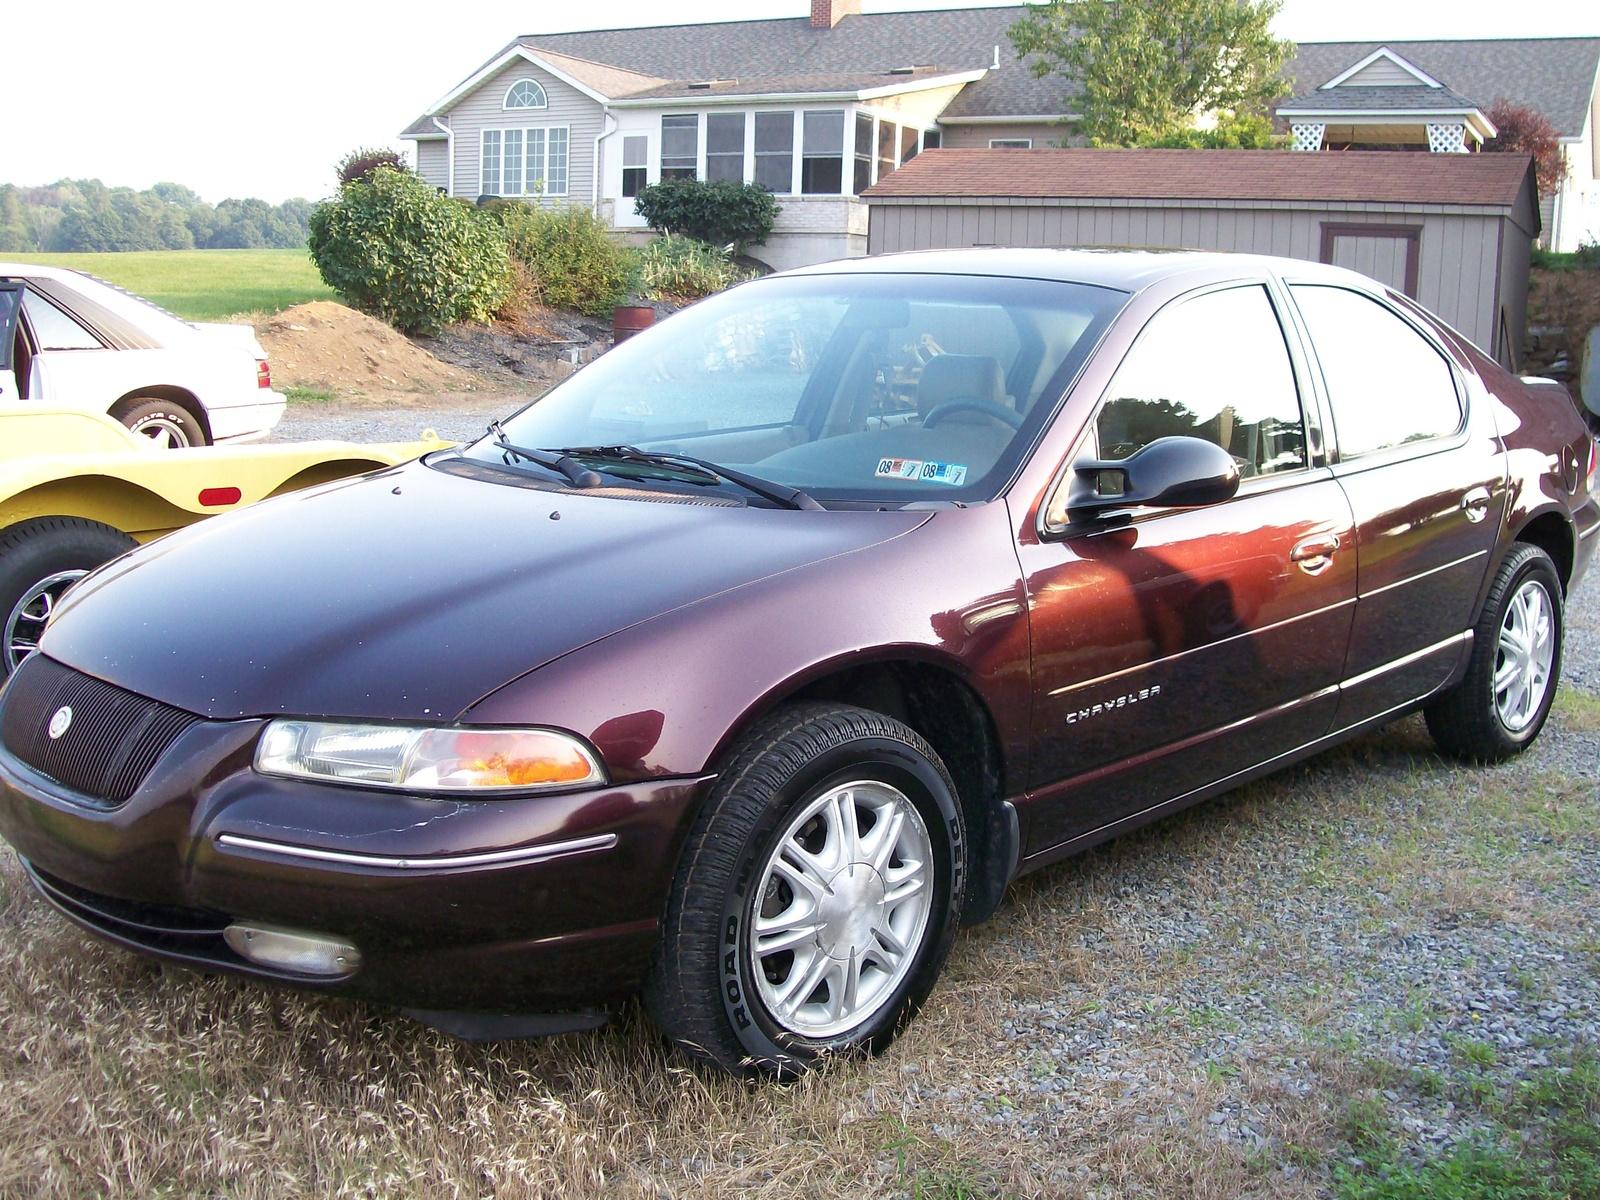 1996 Chrysler Cirrus - Pictures - 1996 Chrysler Cirrus 4 Dr LXi ...